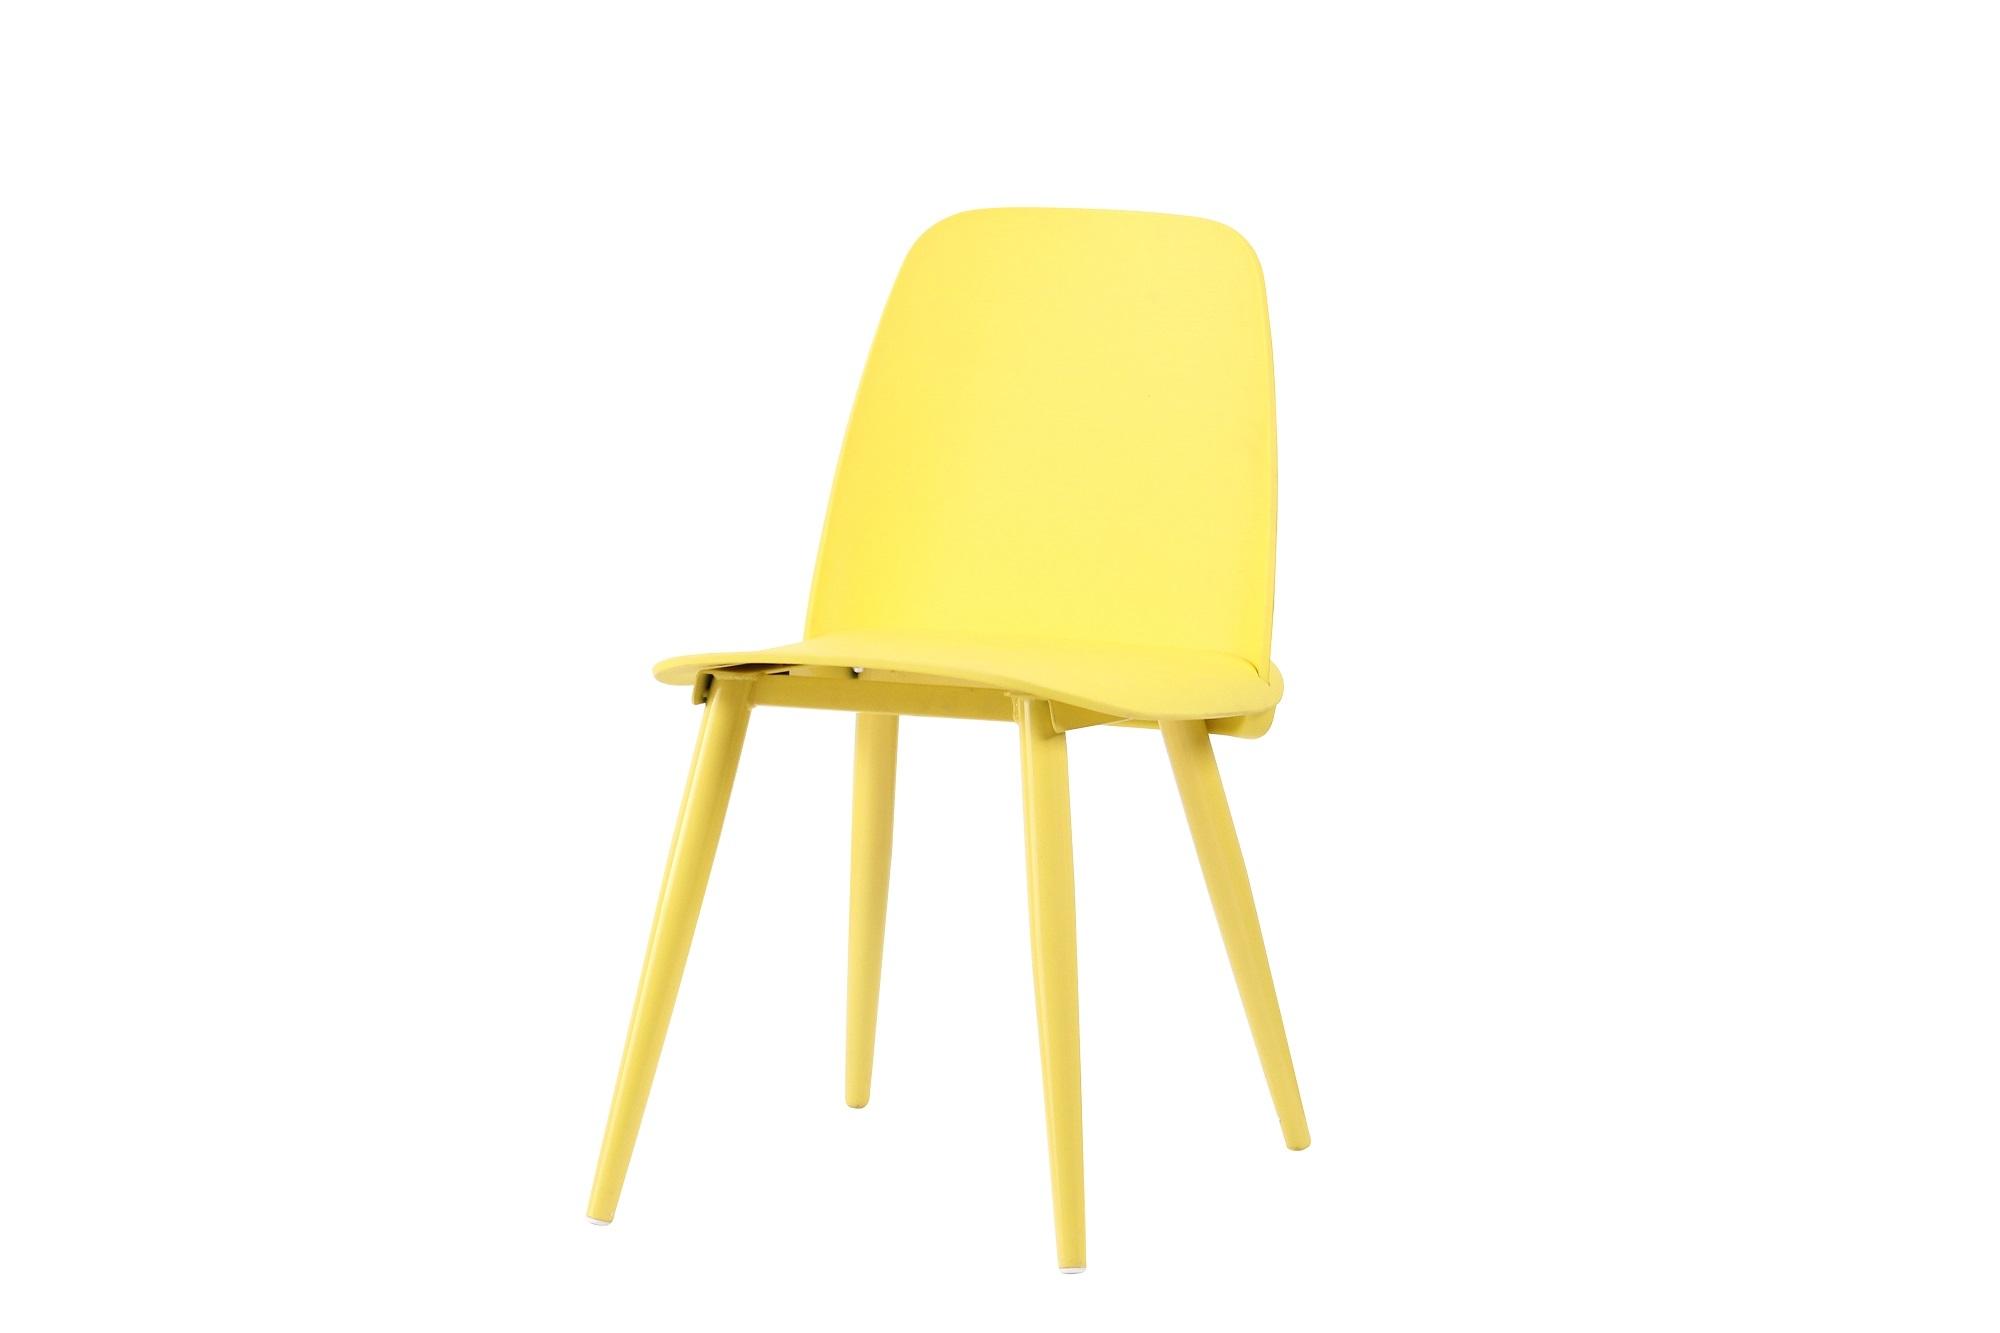 Scaun din plastic cu picioare metalice Sting Yellow l50xA46xH80cm